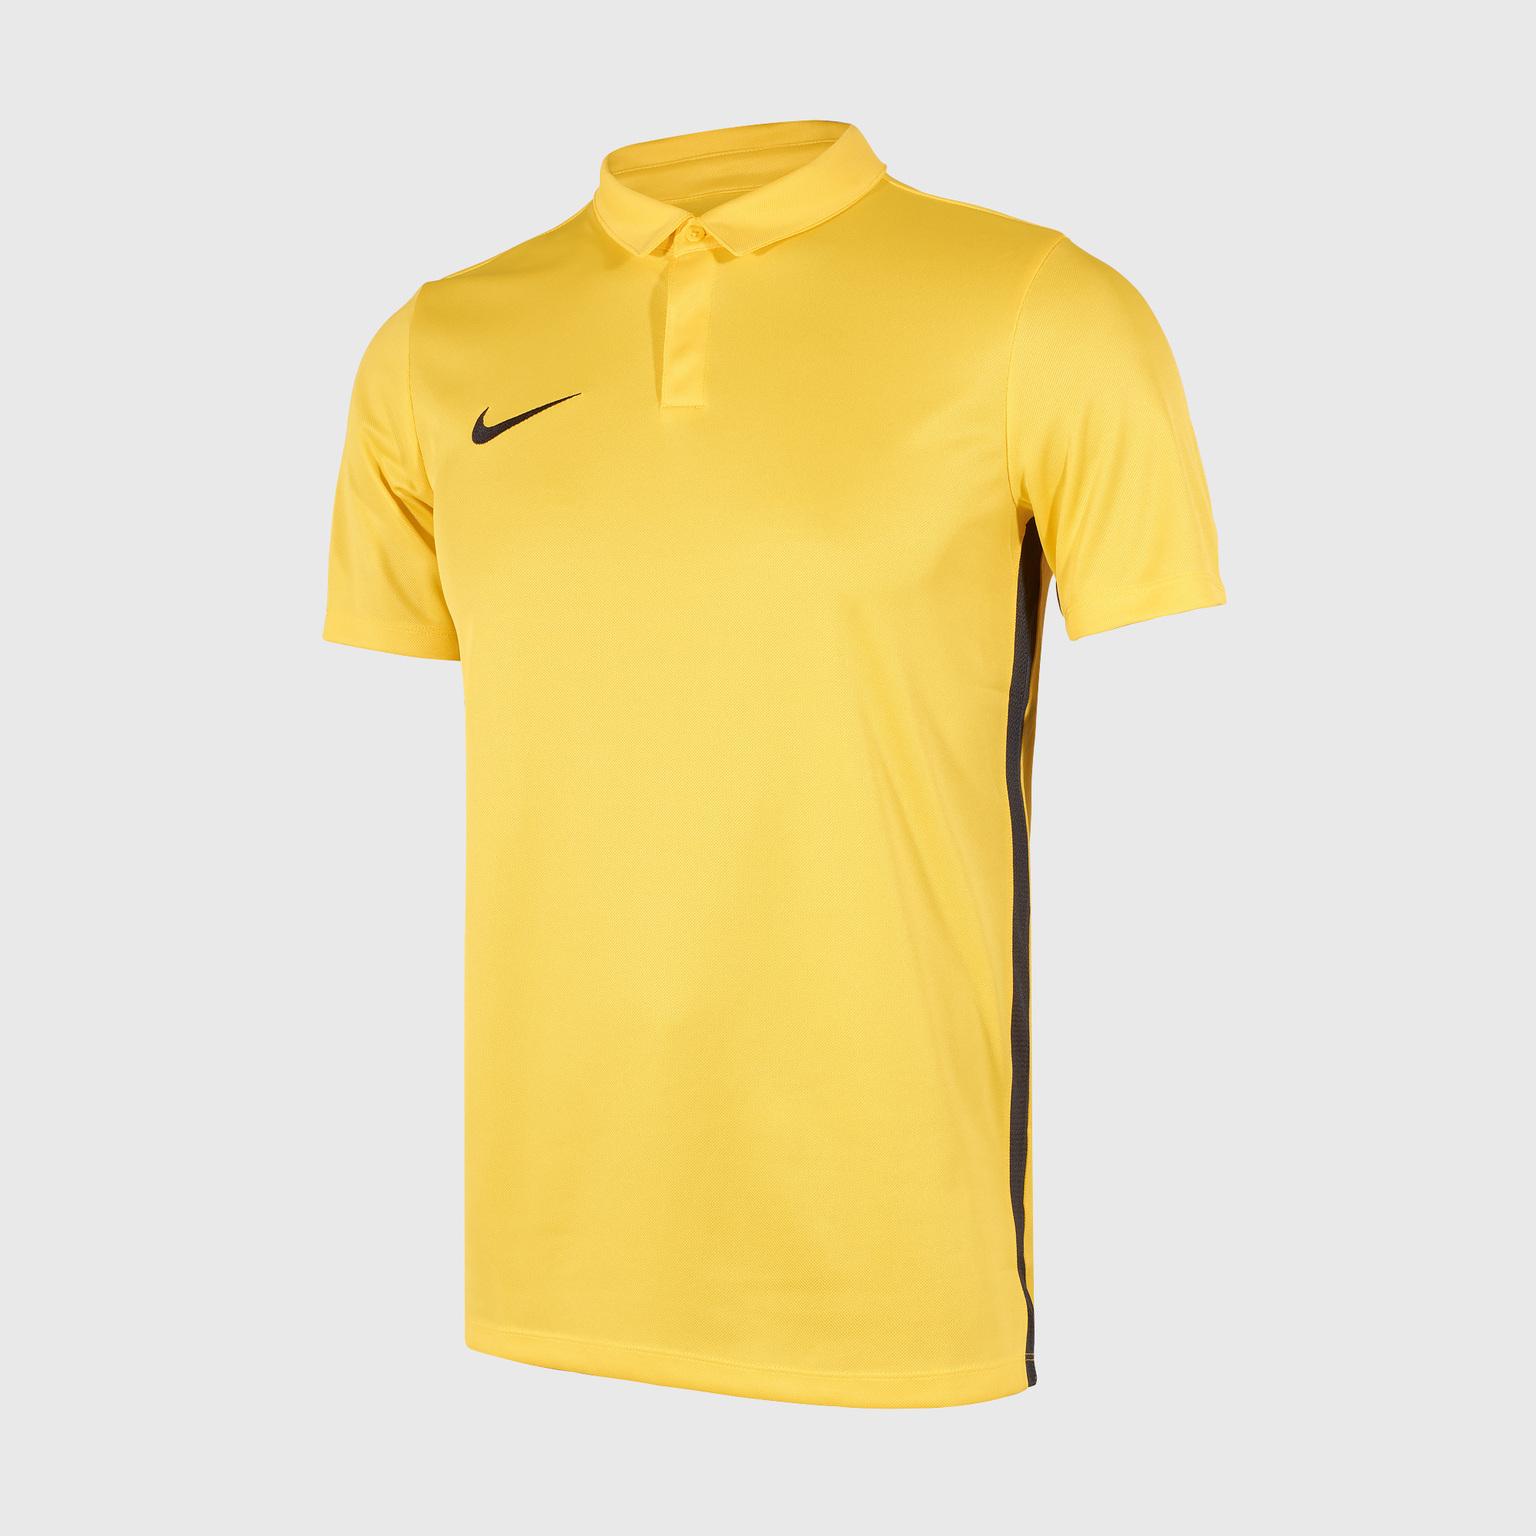 edcfcbf0 Поло Nike Dry Academy18 Polo SS 899984-719 - купить в интернет магазине  footballstore, цена, фото